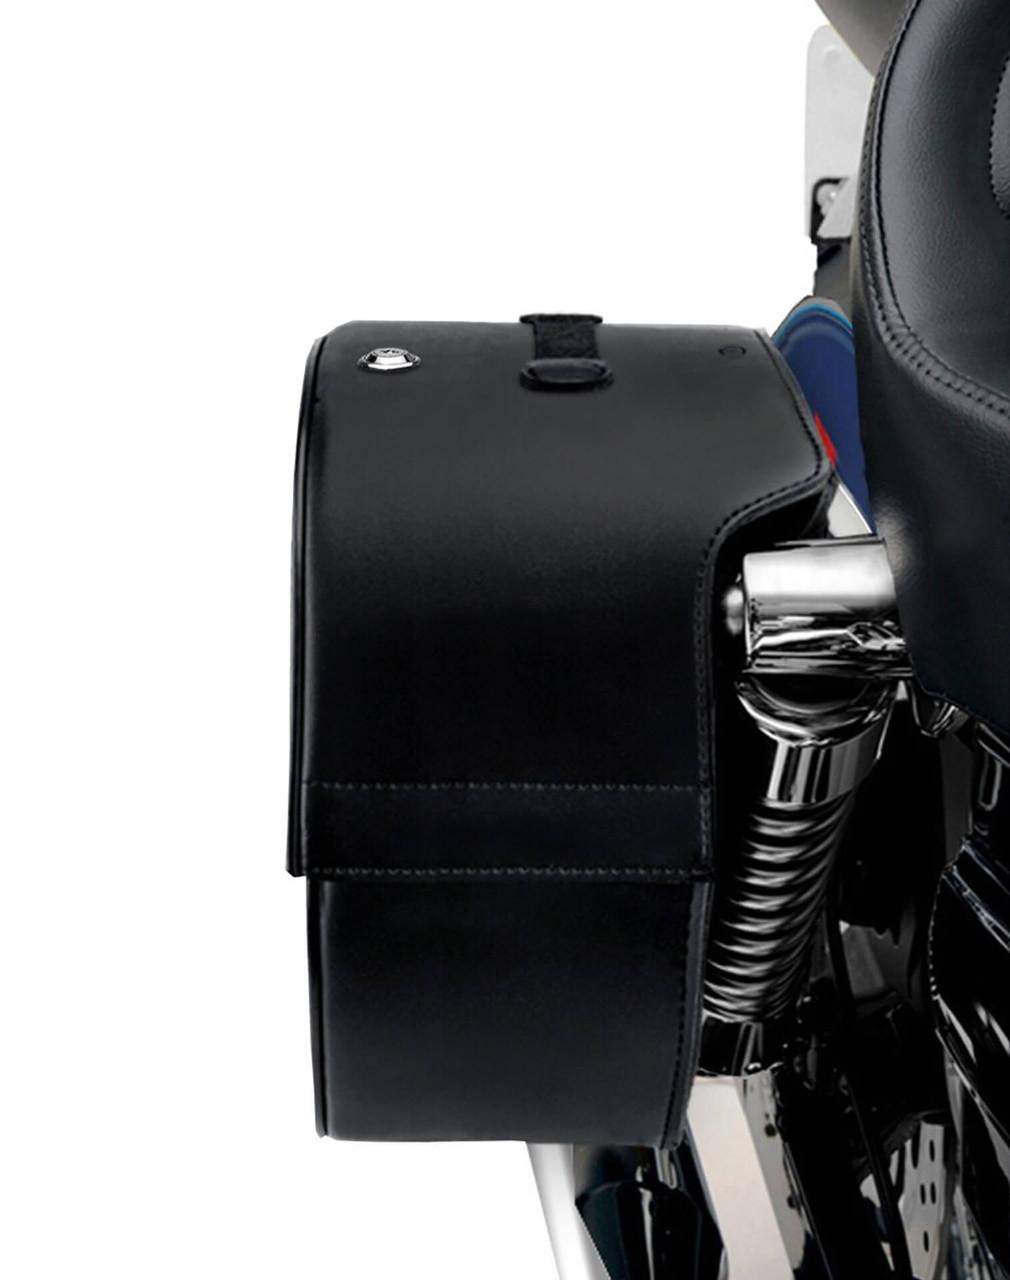 Honda 1500 Valkyrie Standard Spear Shock Cutout Motorcycle saddlebags Shock Cutout View